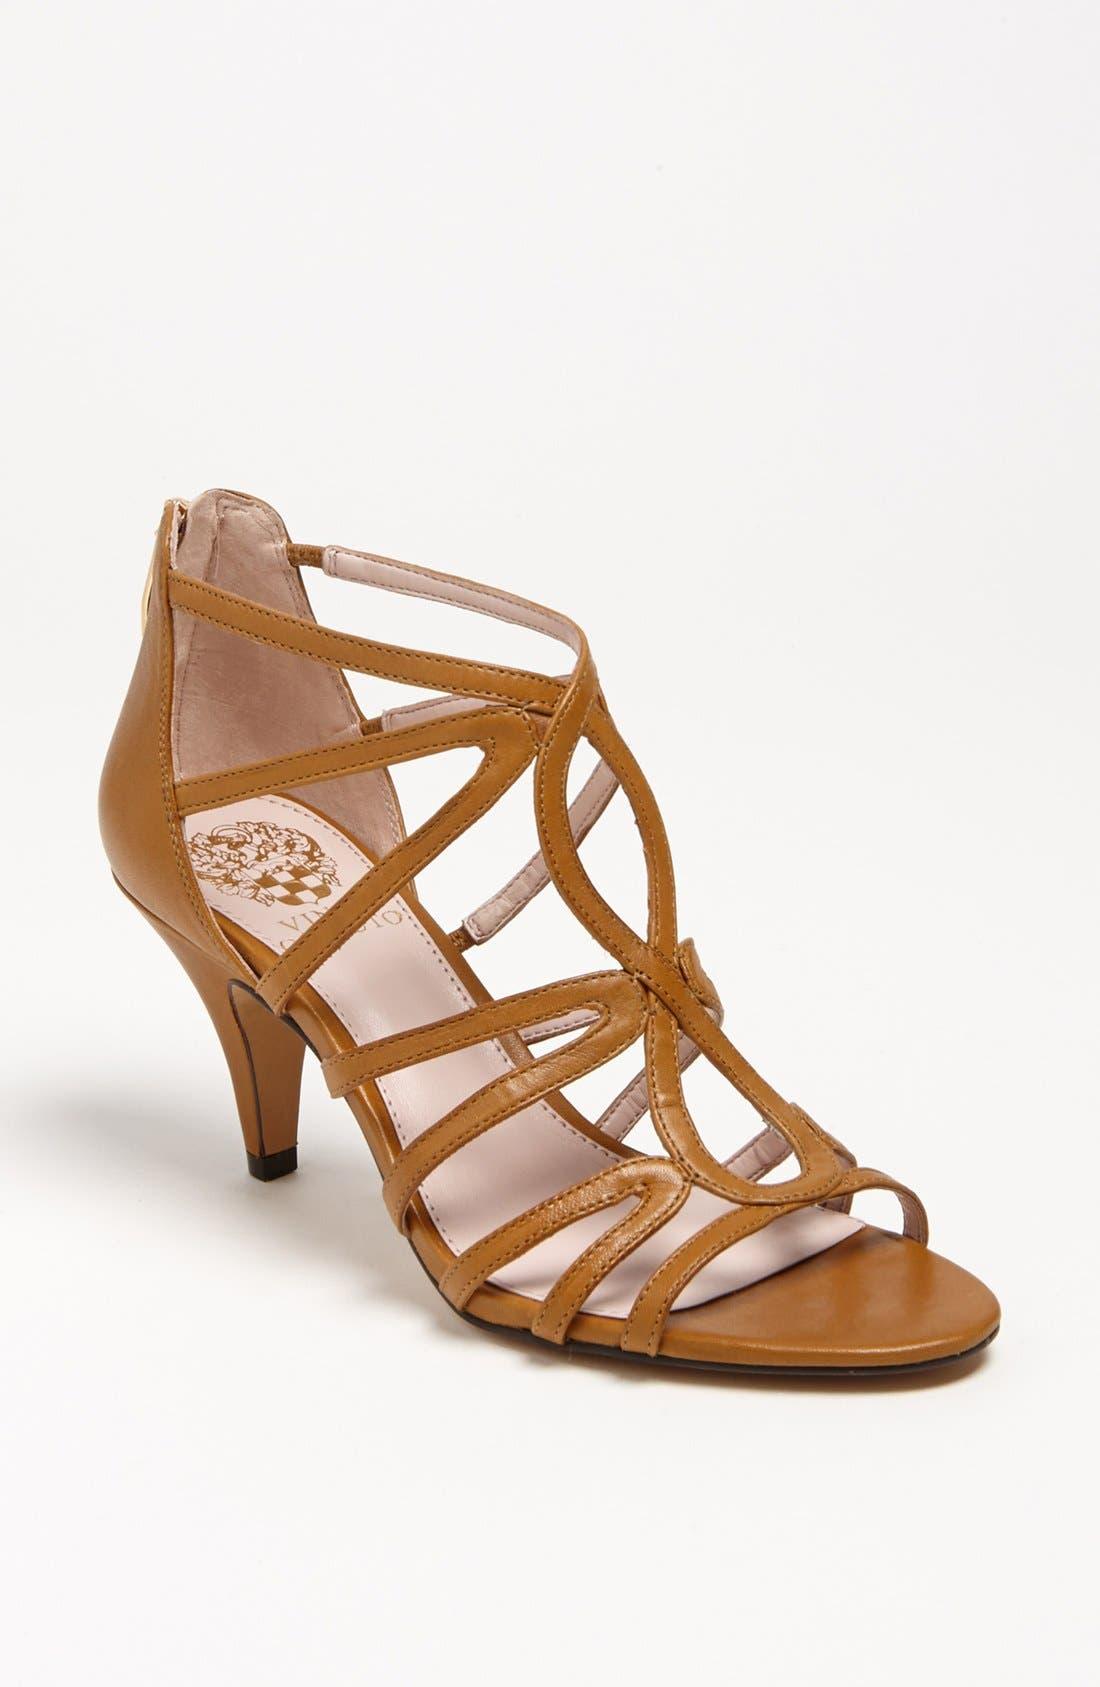 Alternate Image 1 Selected - Vince Camuto 'Massi' Sandal